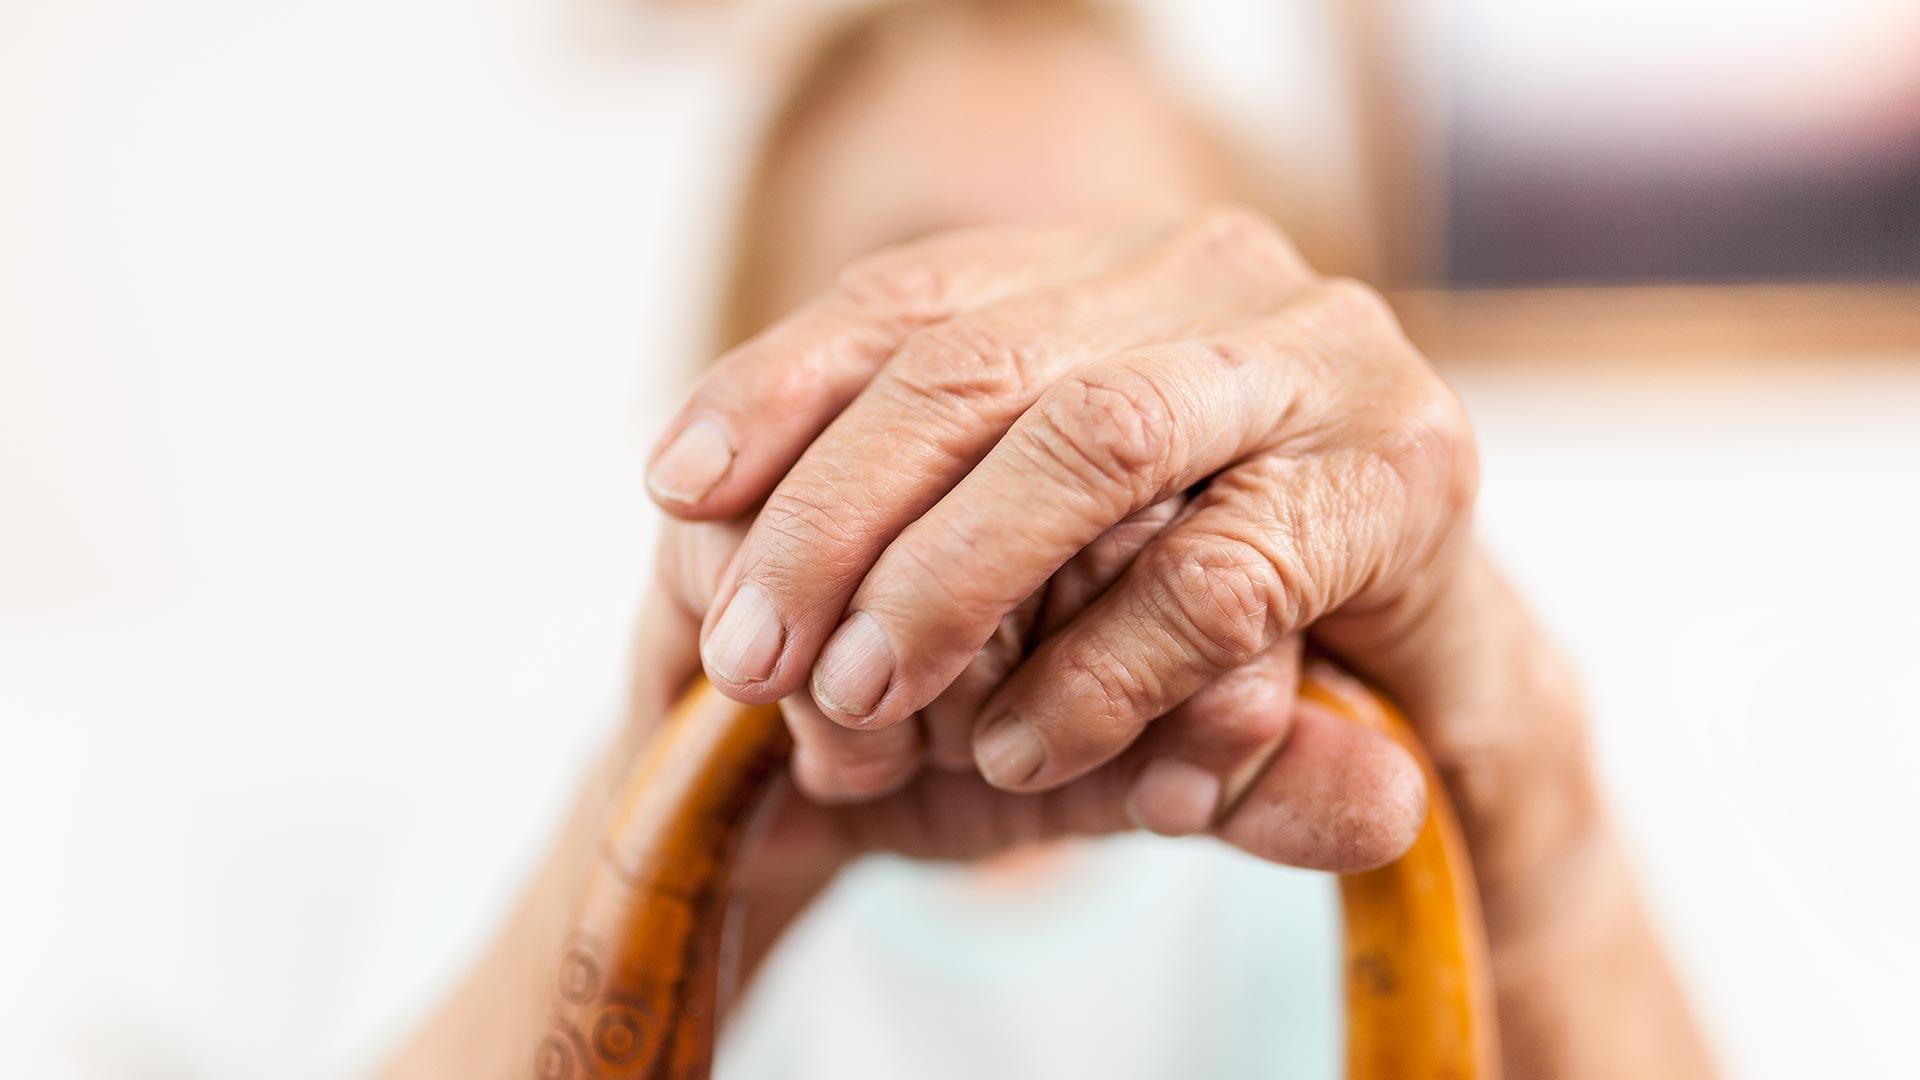 Cyprus Association of Registered Podiatrists - Blog, Rheumatoid Arthritis